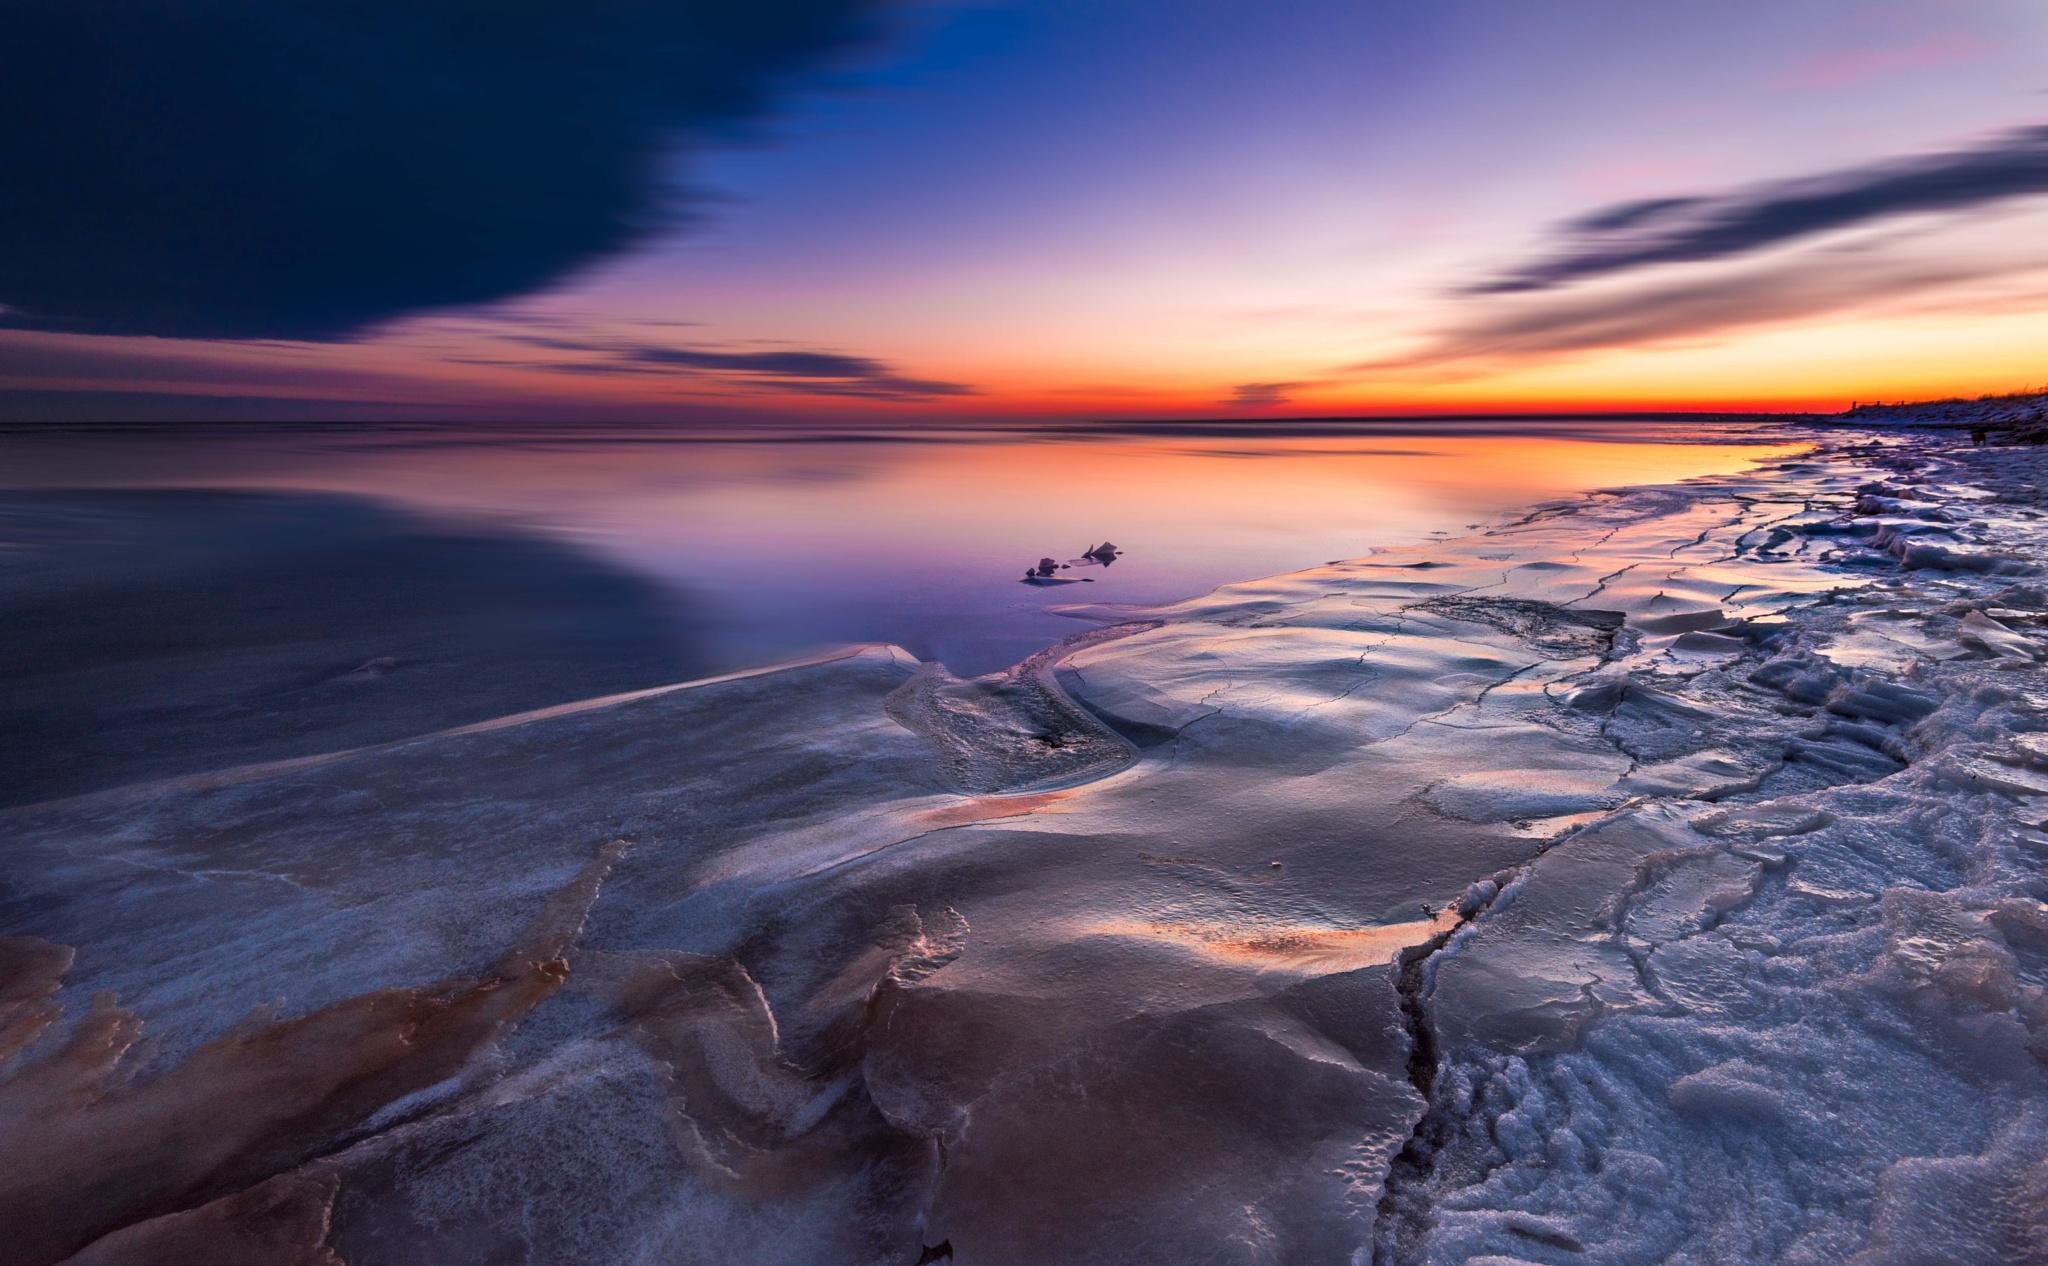 Icy Beach by Alec Hickman